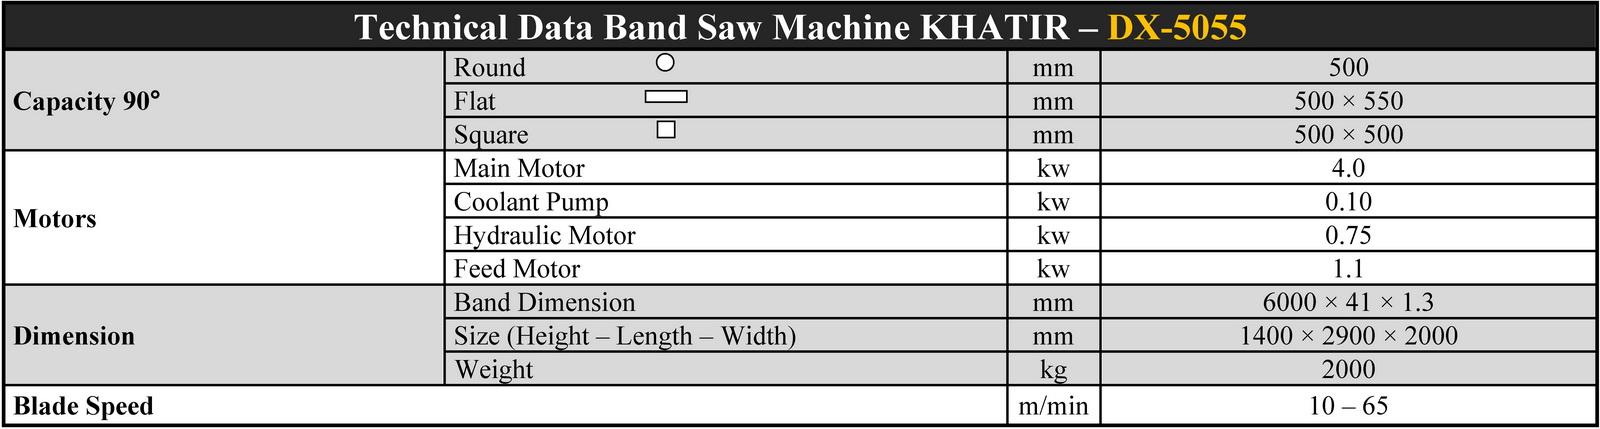 DX 5055G - مشخصات فنی دستگاه اره نواری دو ستون اتوماتیک خطیر